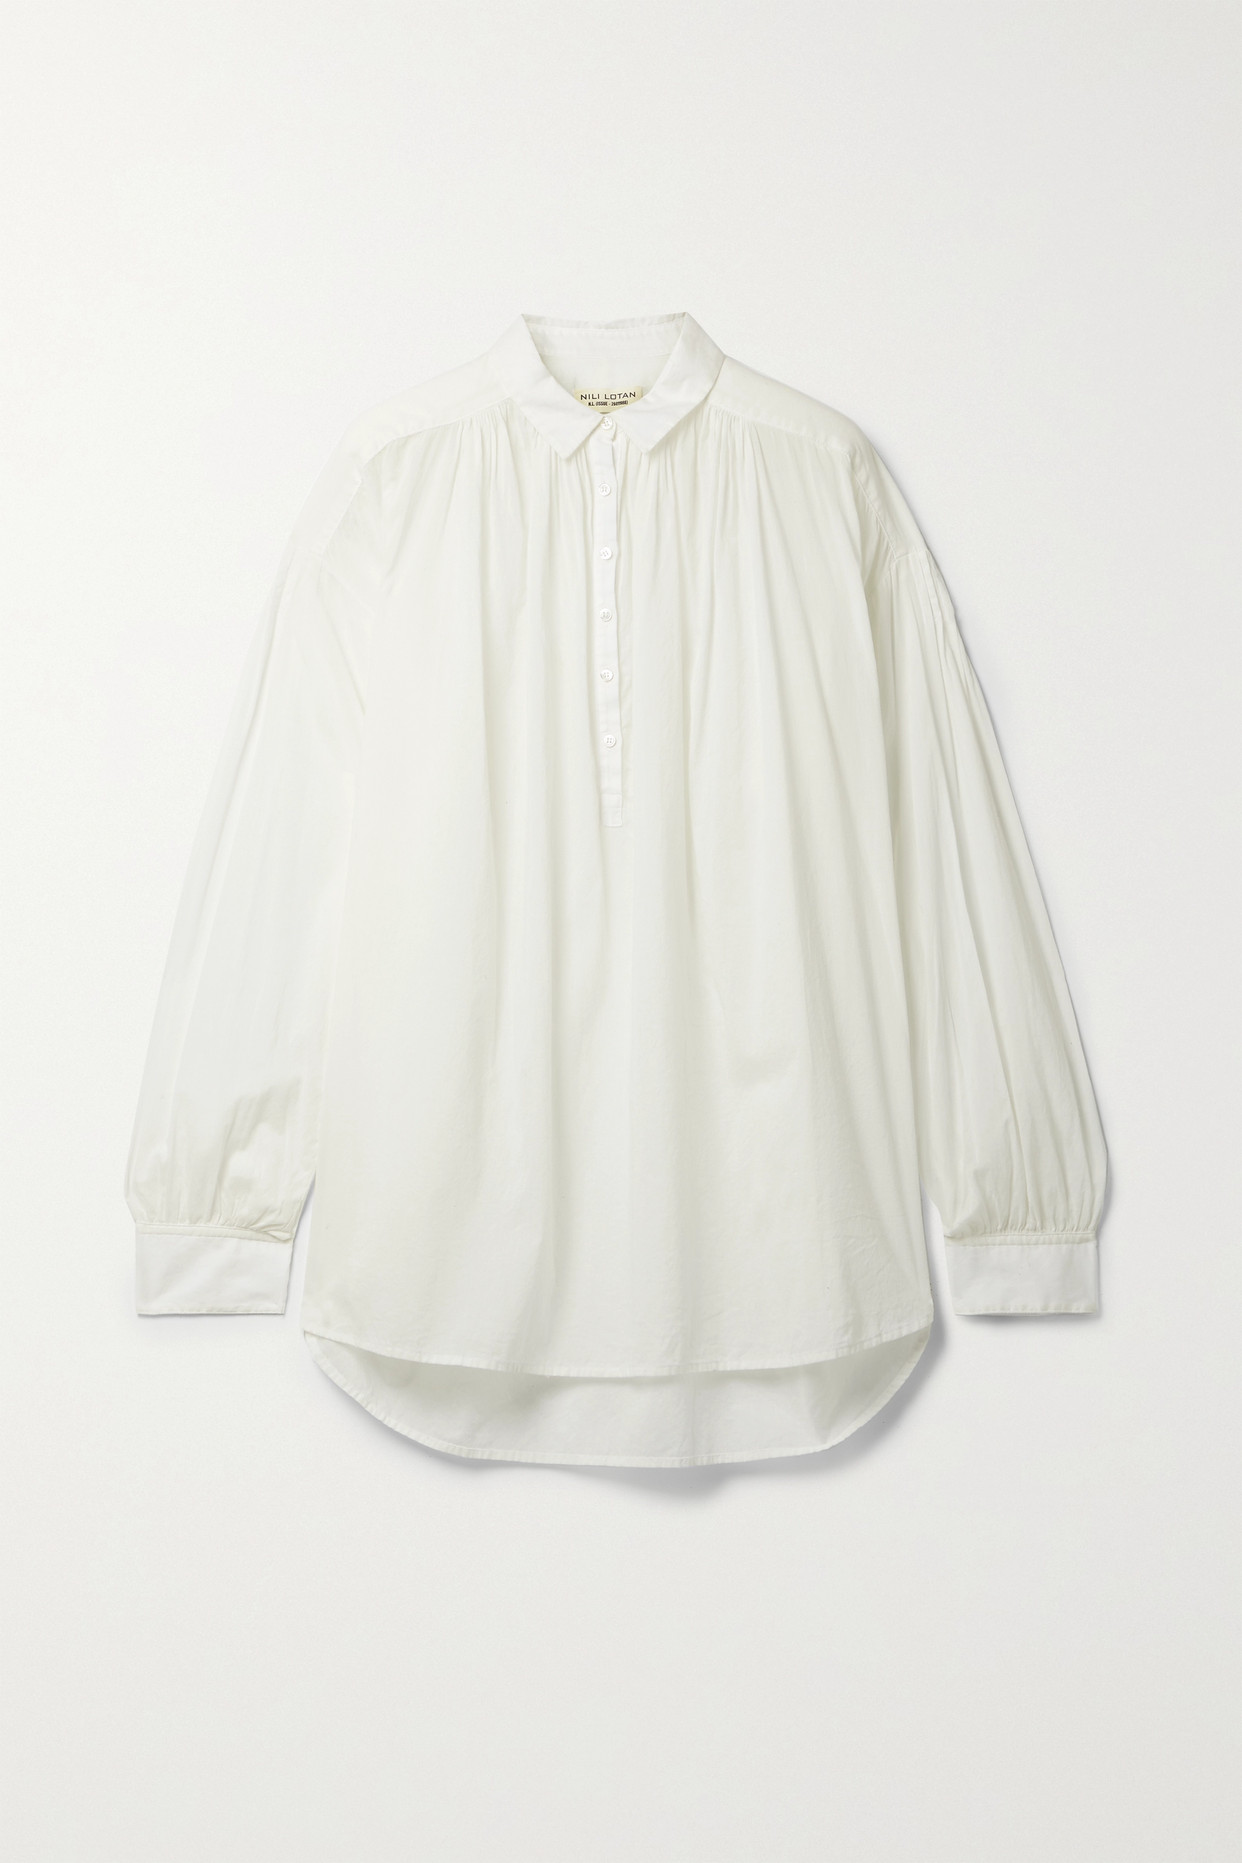 NILI LOTAN - Miles Gathered Cotton-voile Blouse - White - large